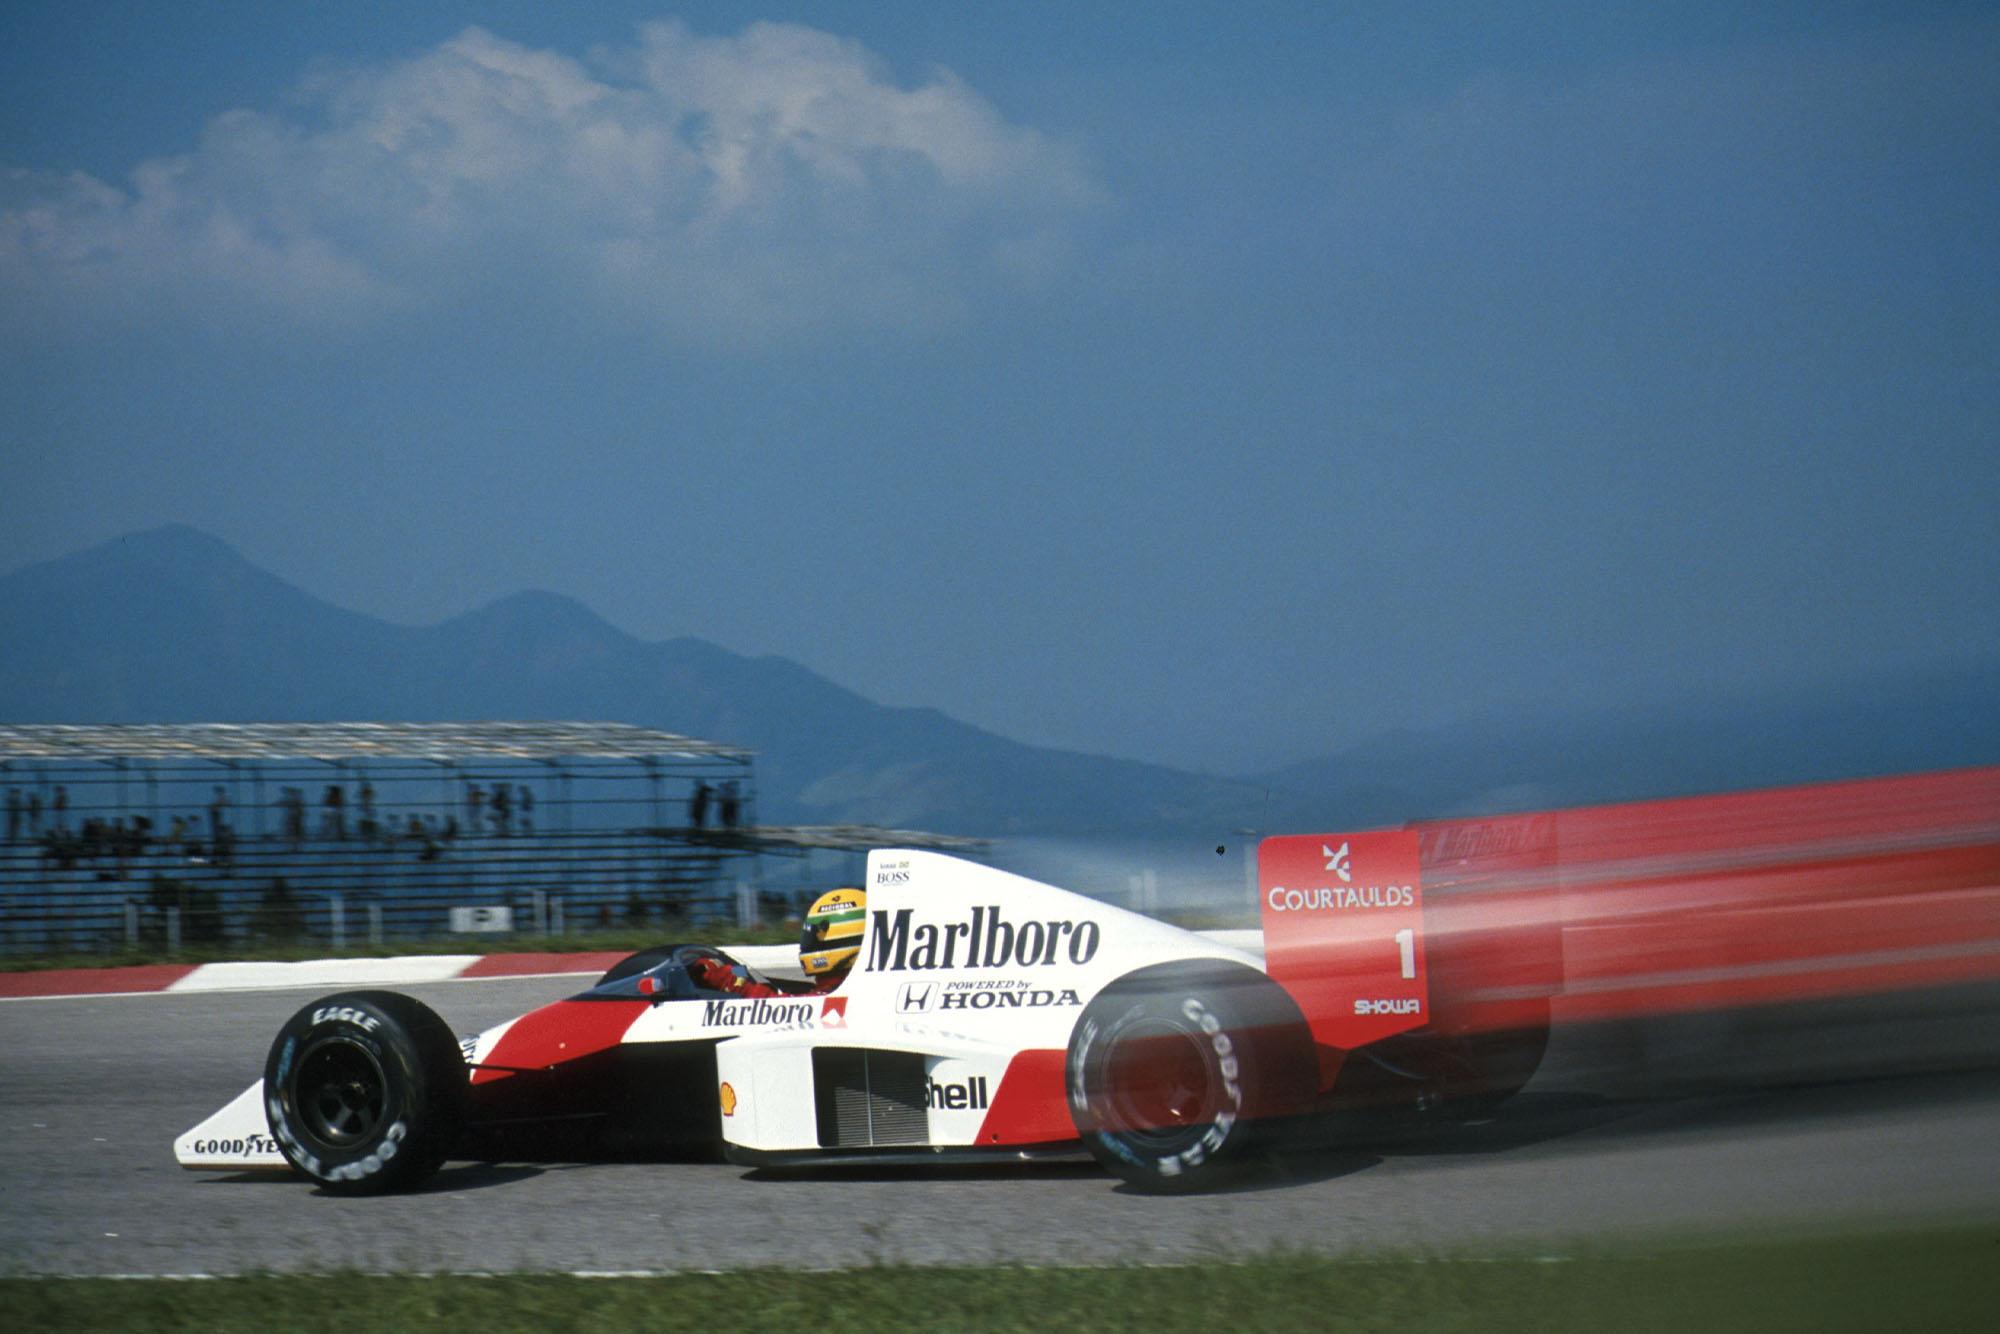 1989 Brazilian GP Senna pole